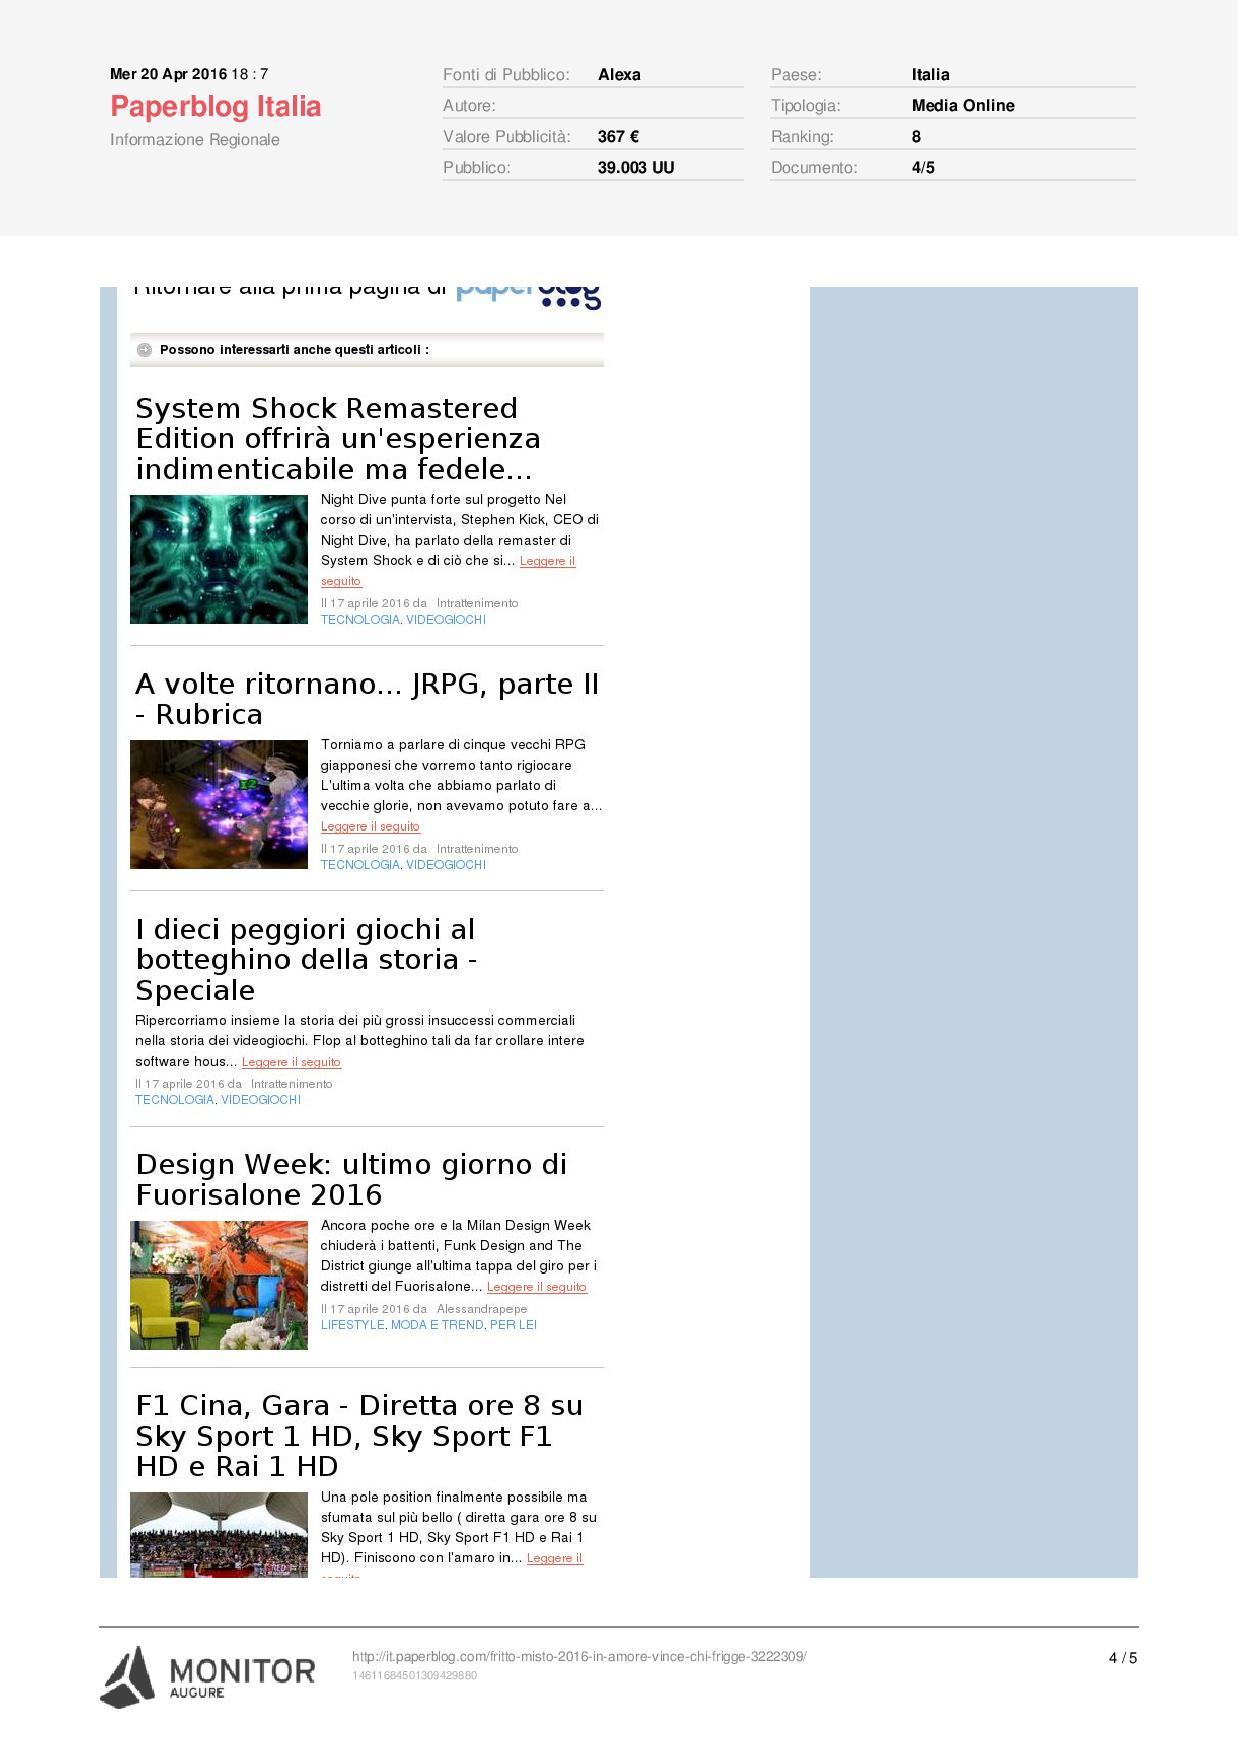 20.04.16_paperblog.com-page-004